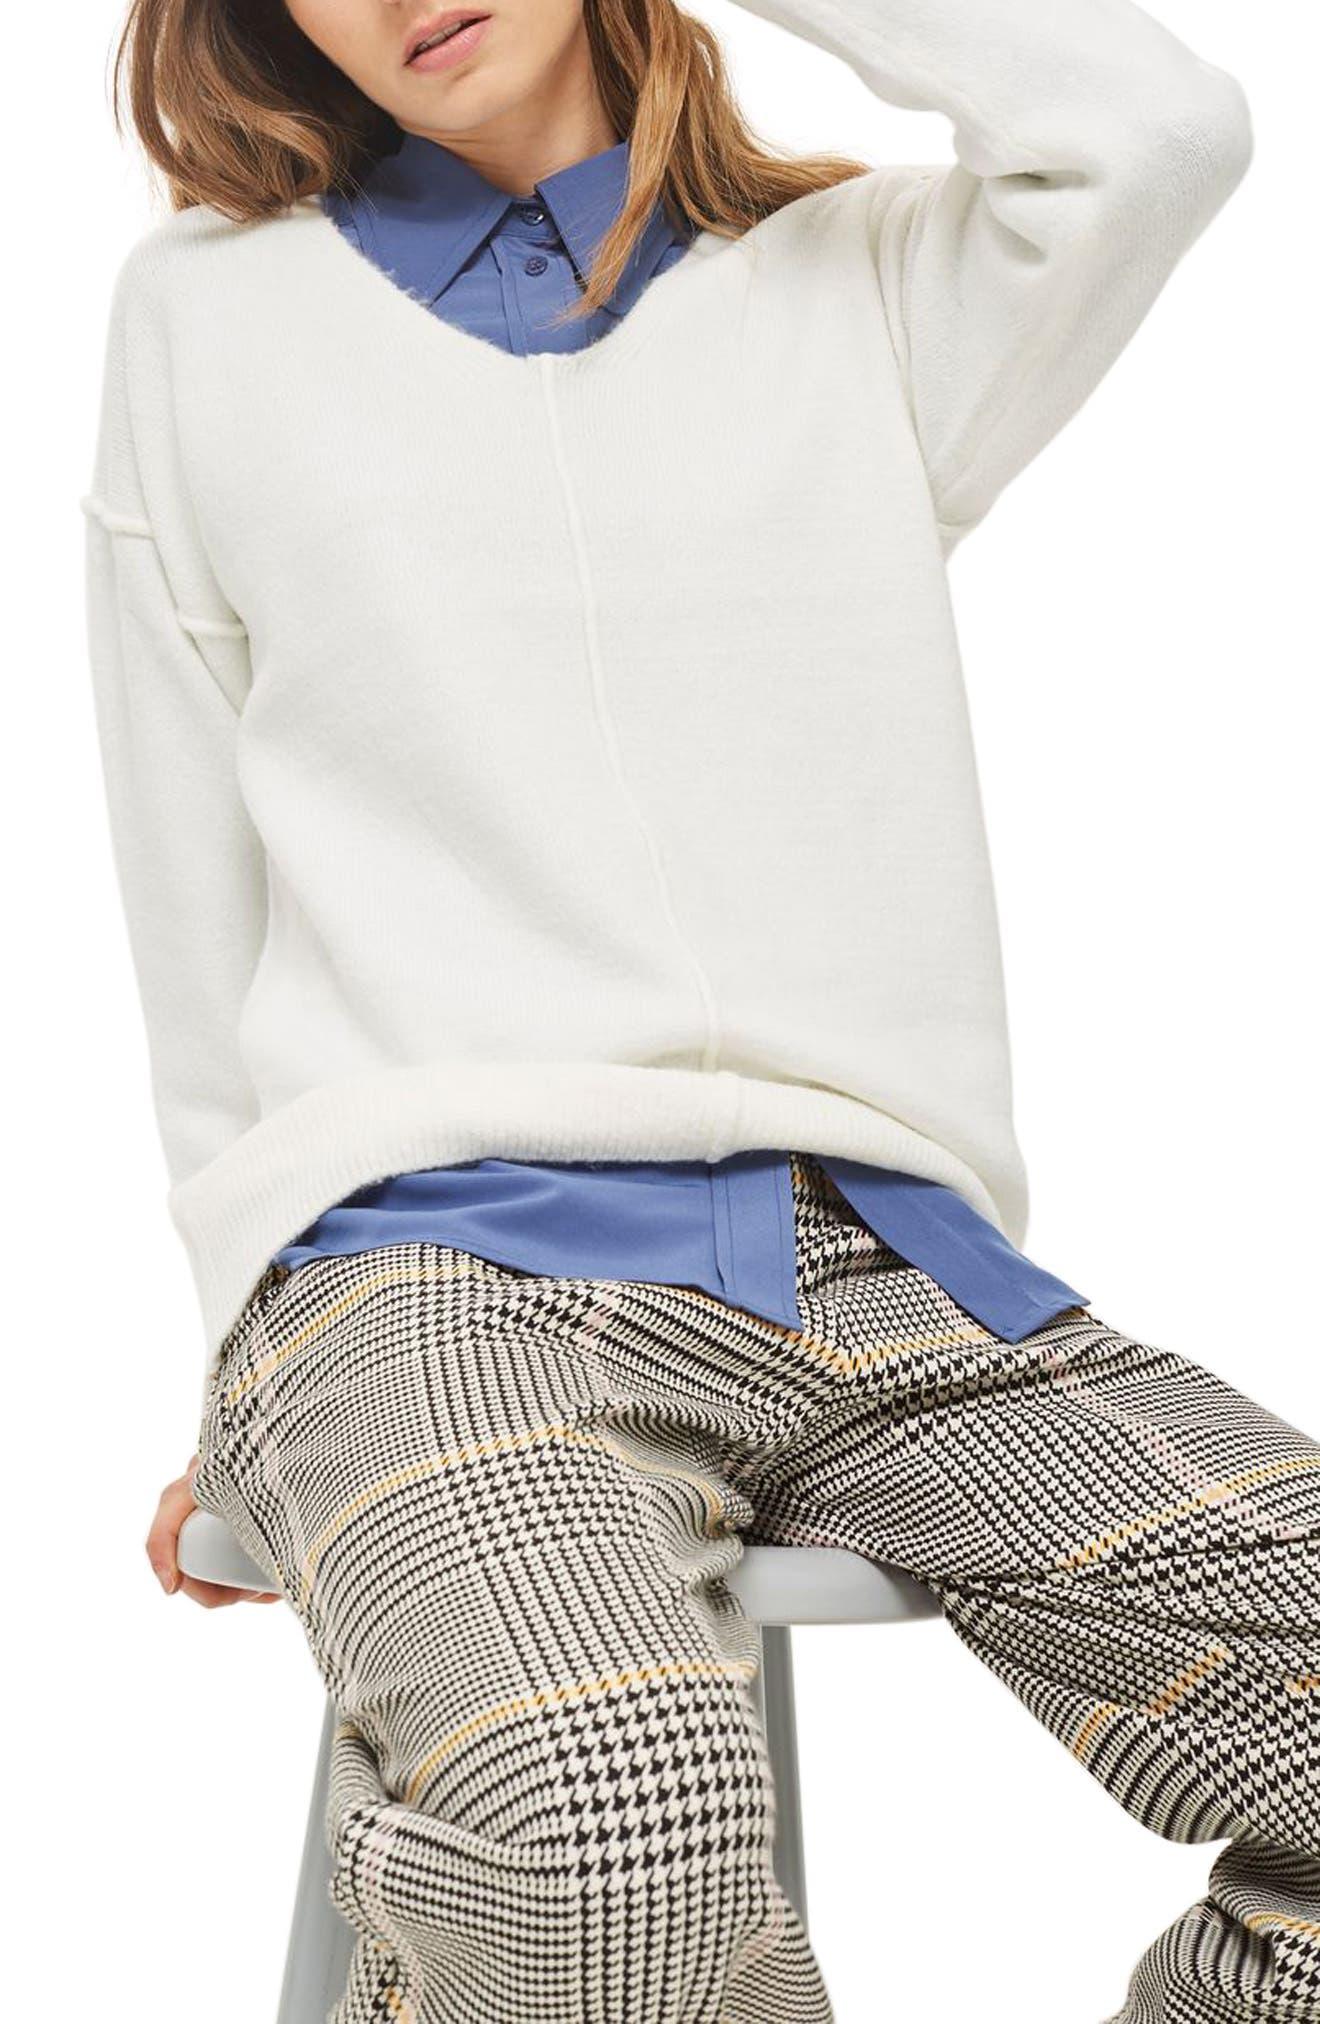 Topshop Exposed Seam Longline Sweater (Petite)